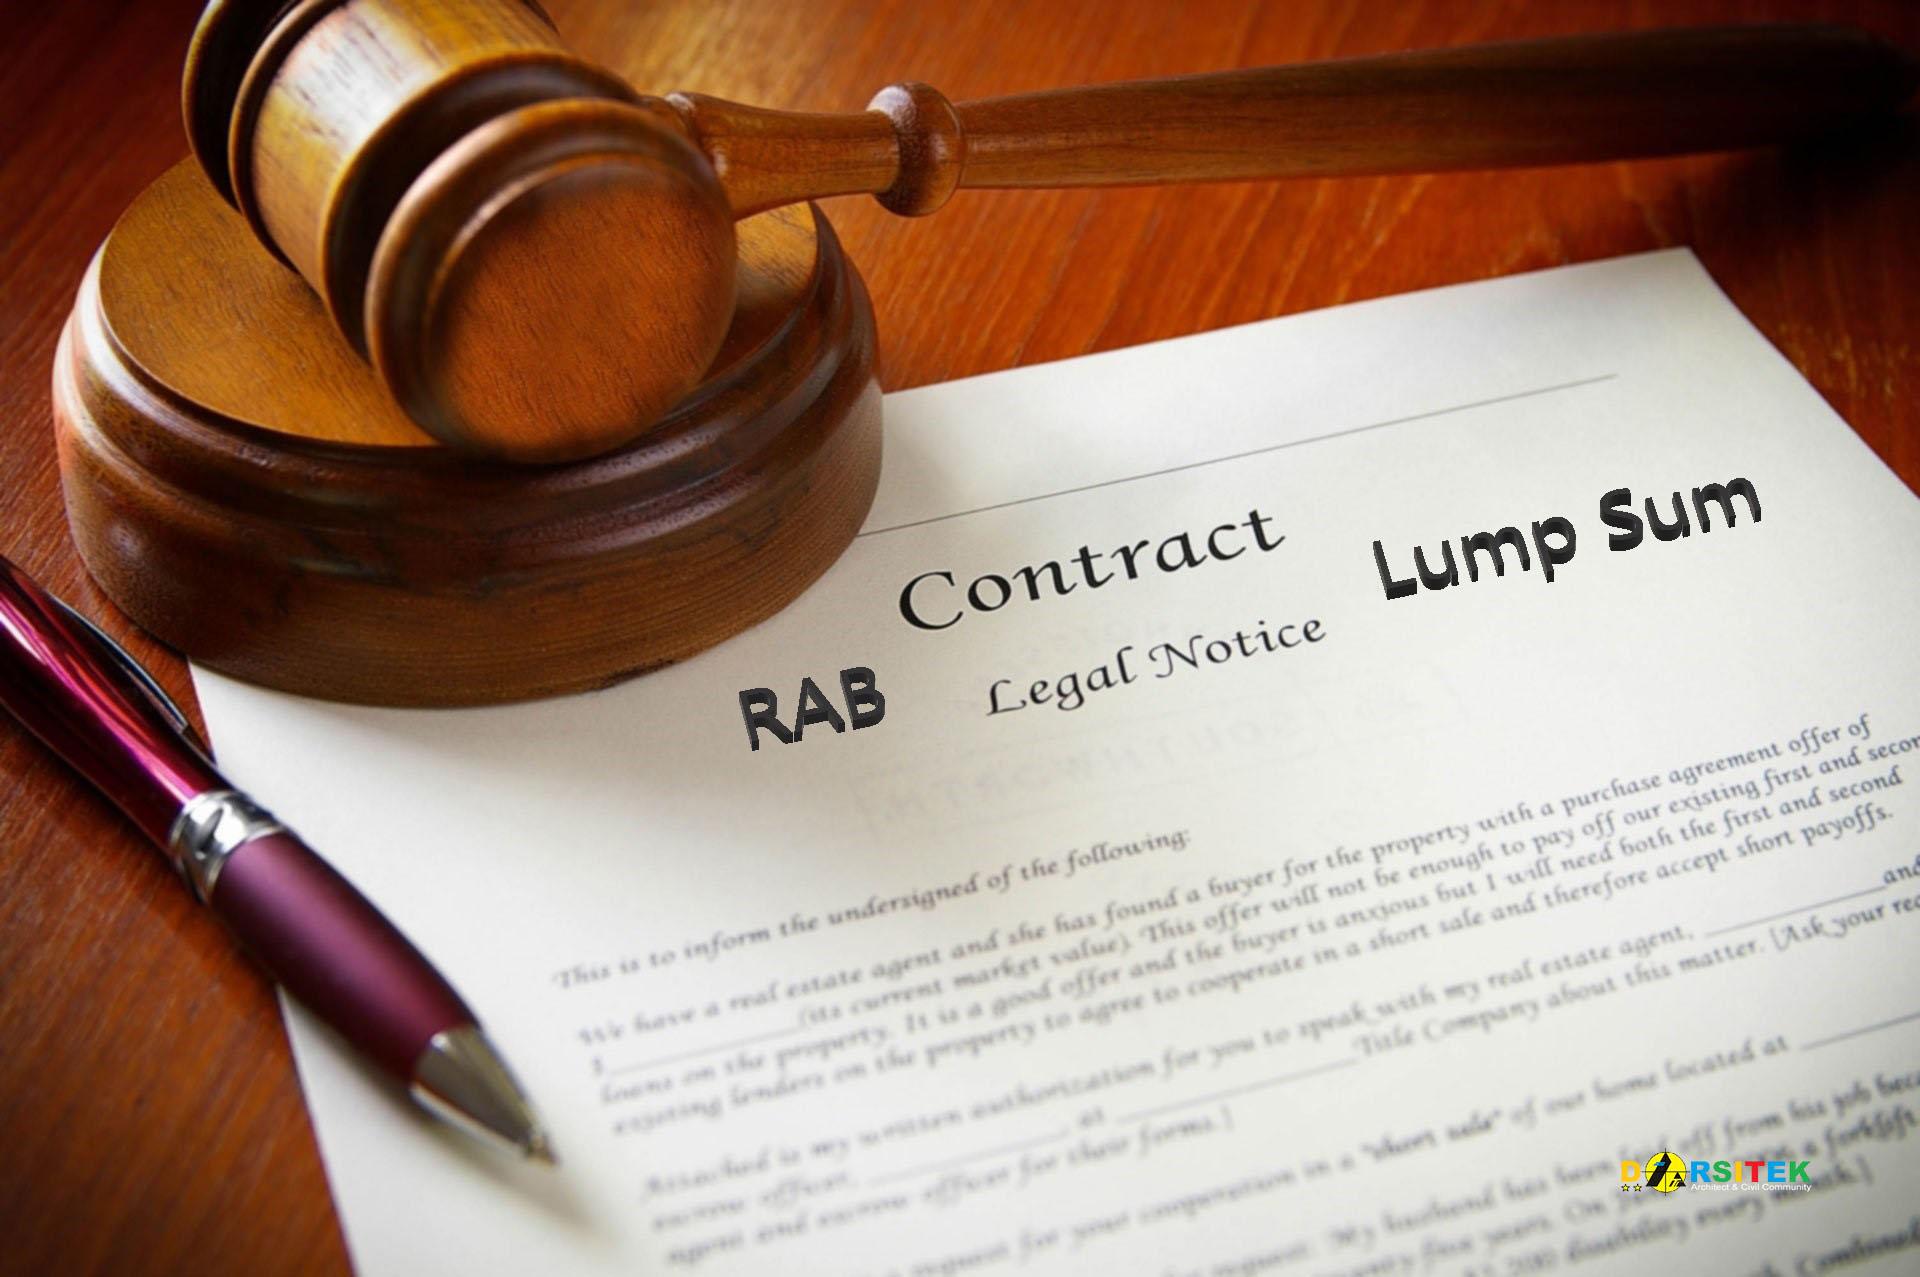 rab kontrak lump sum